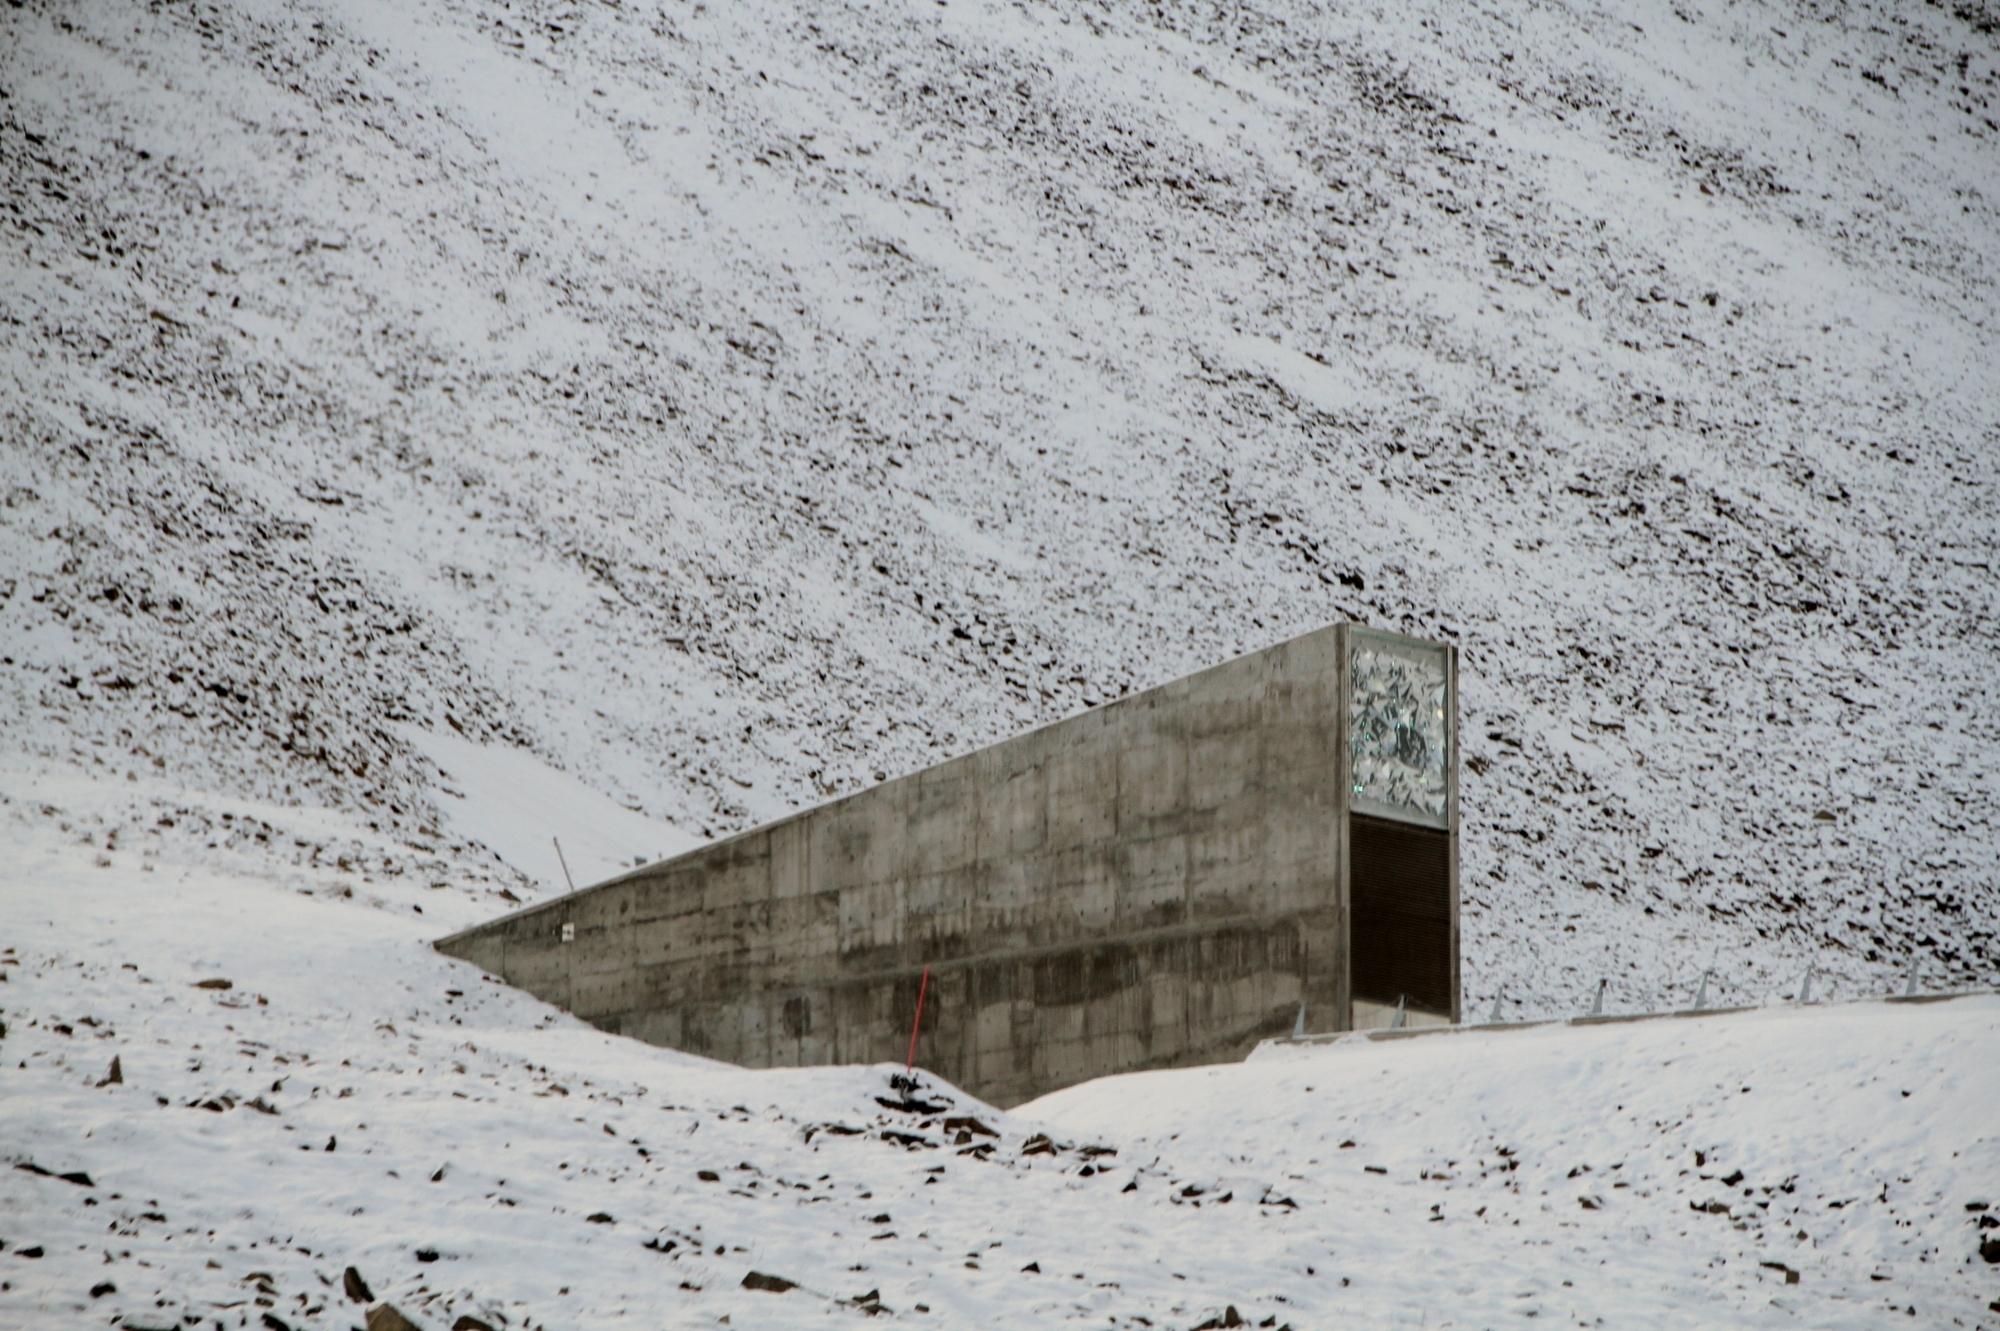 Svalbard Doomsday Seed Vault Floods After Record Winter